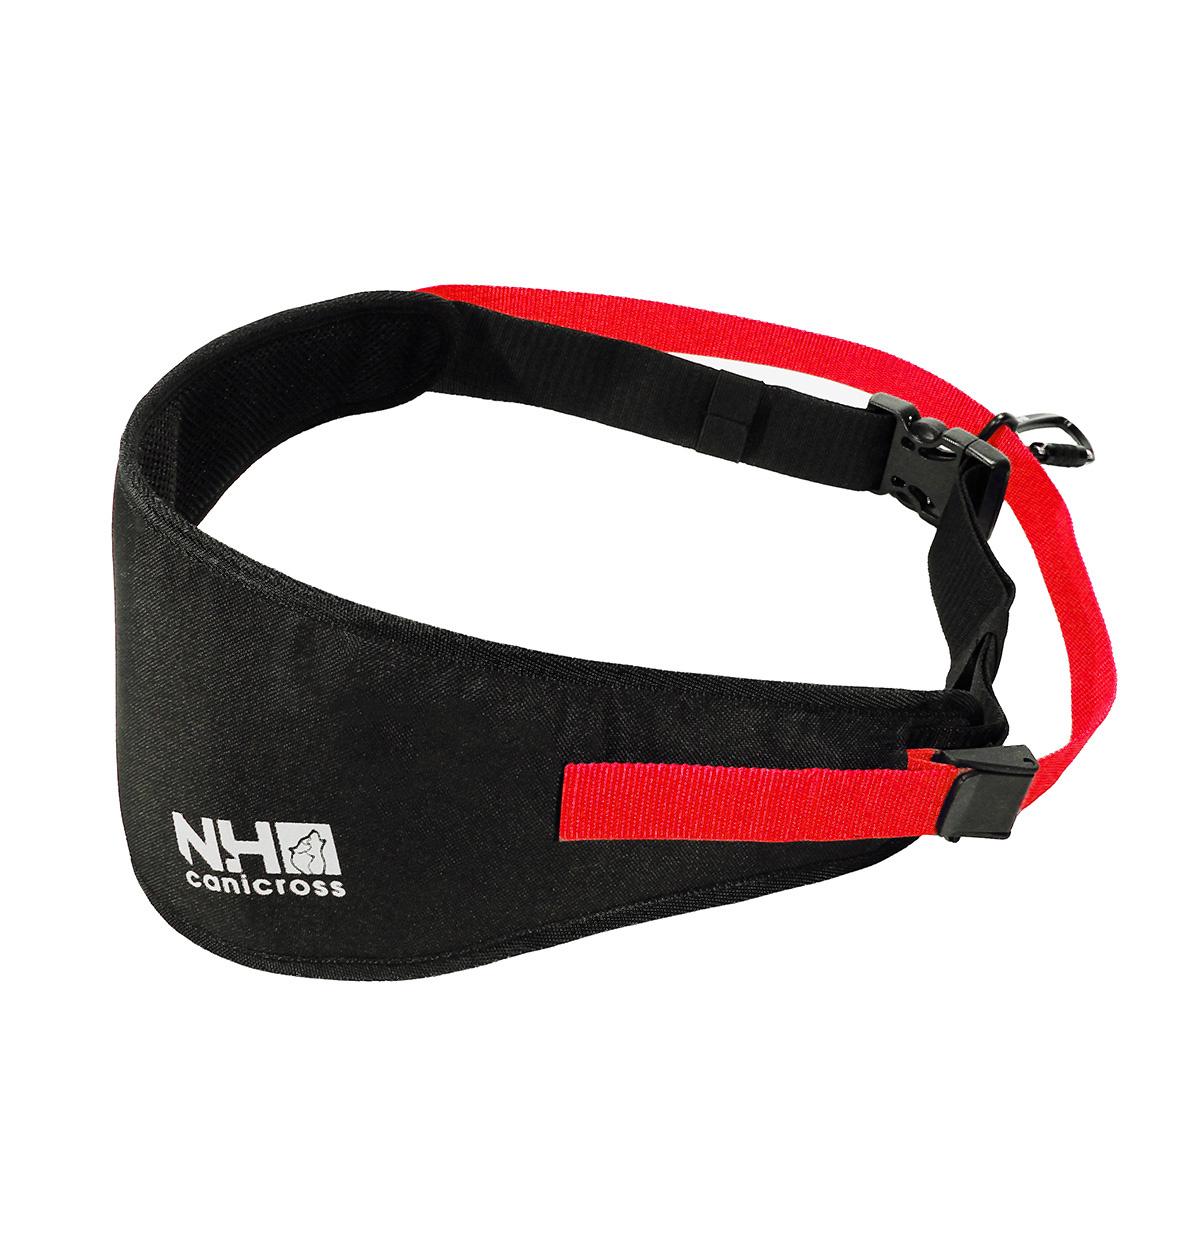 Northern Howl Handsfree Dog Walking Running Jogging Waist Belt - black